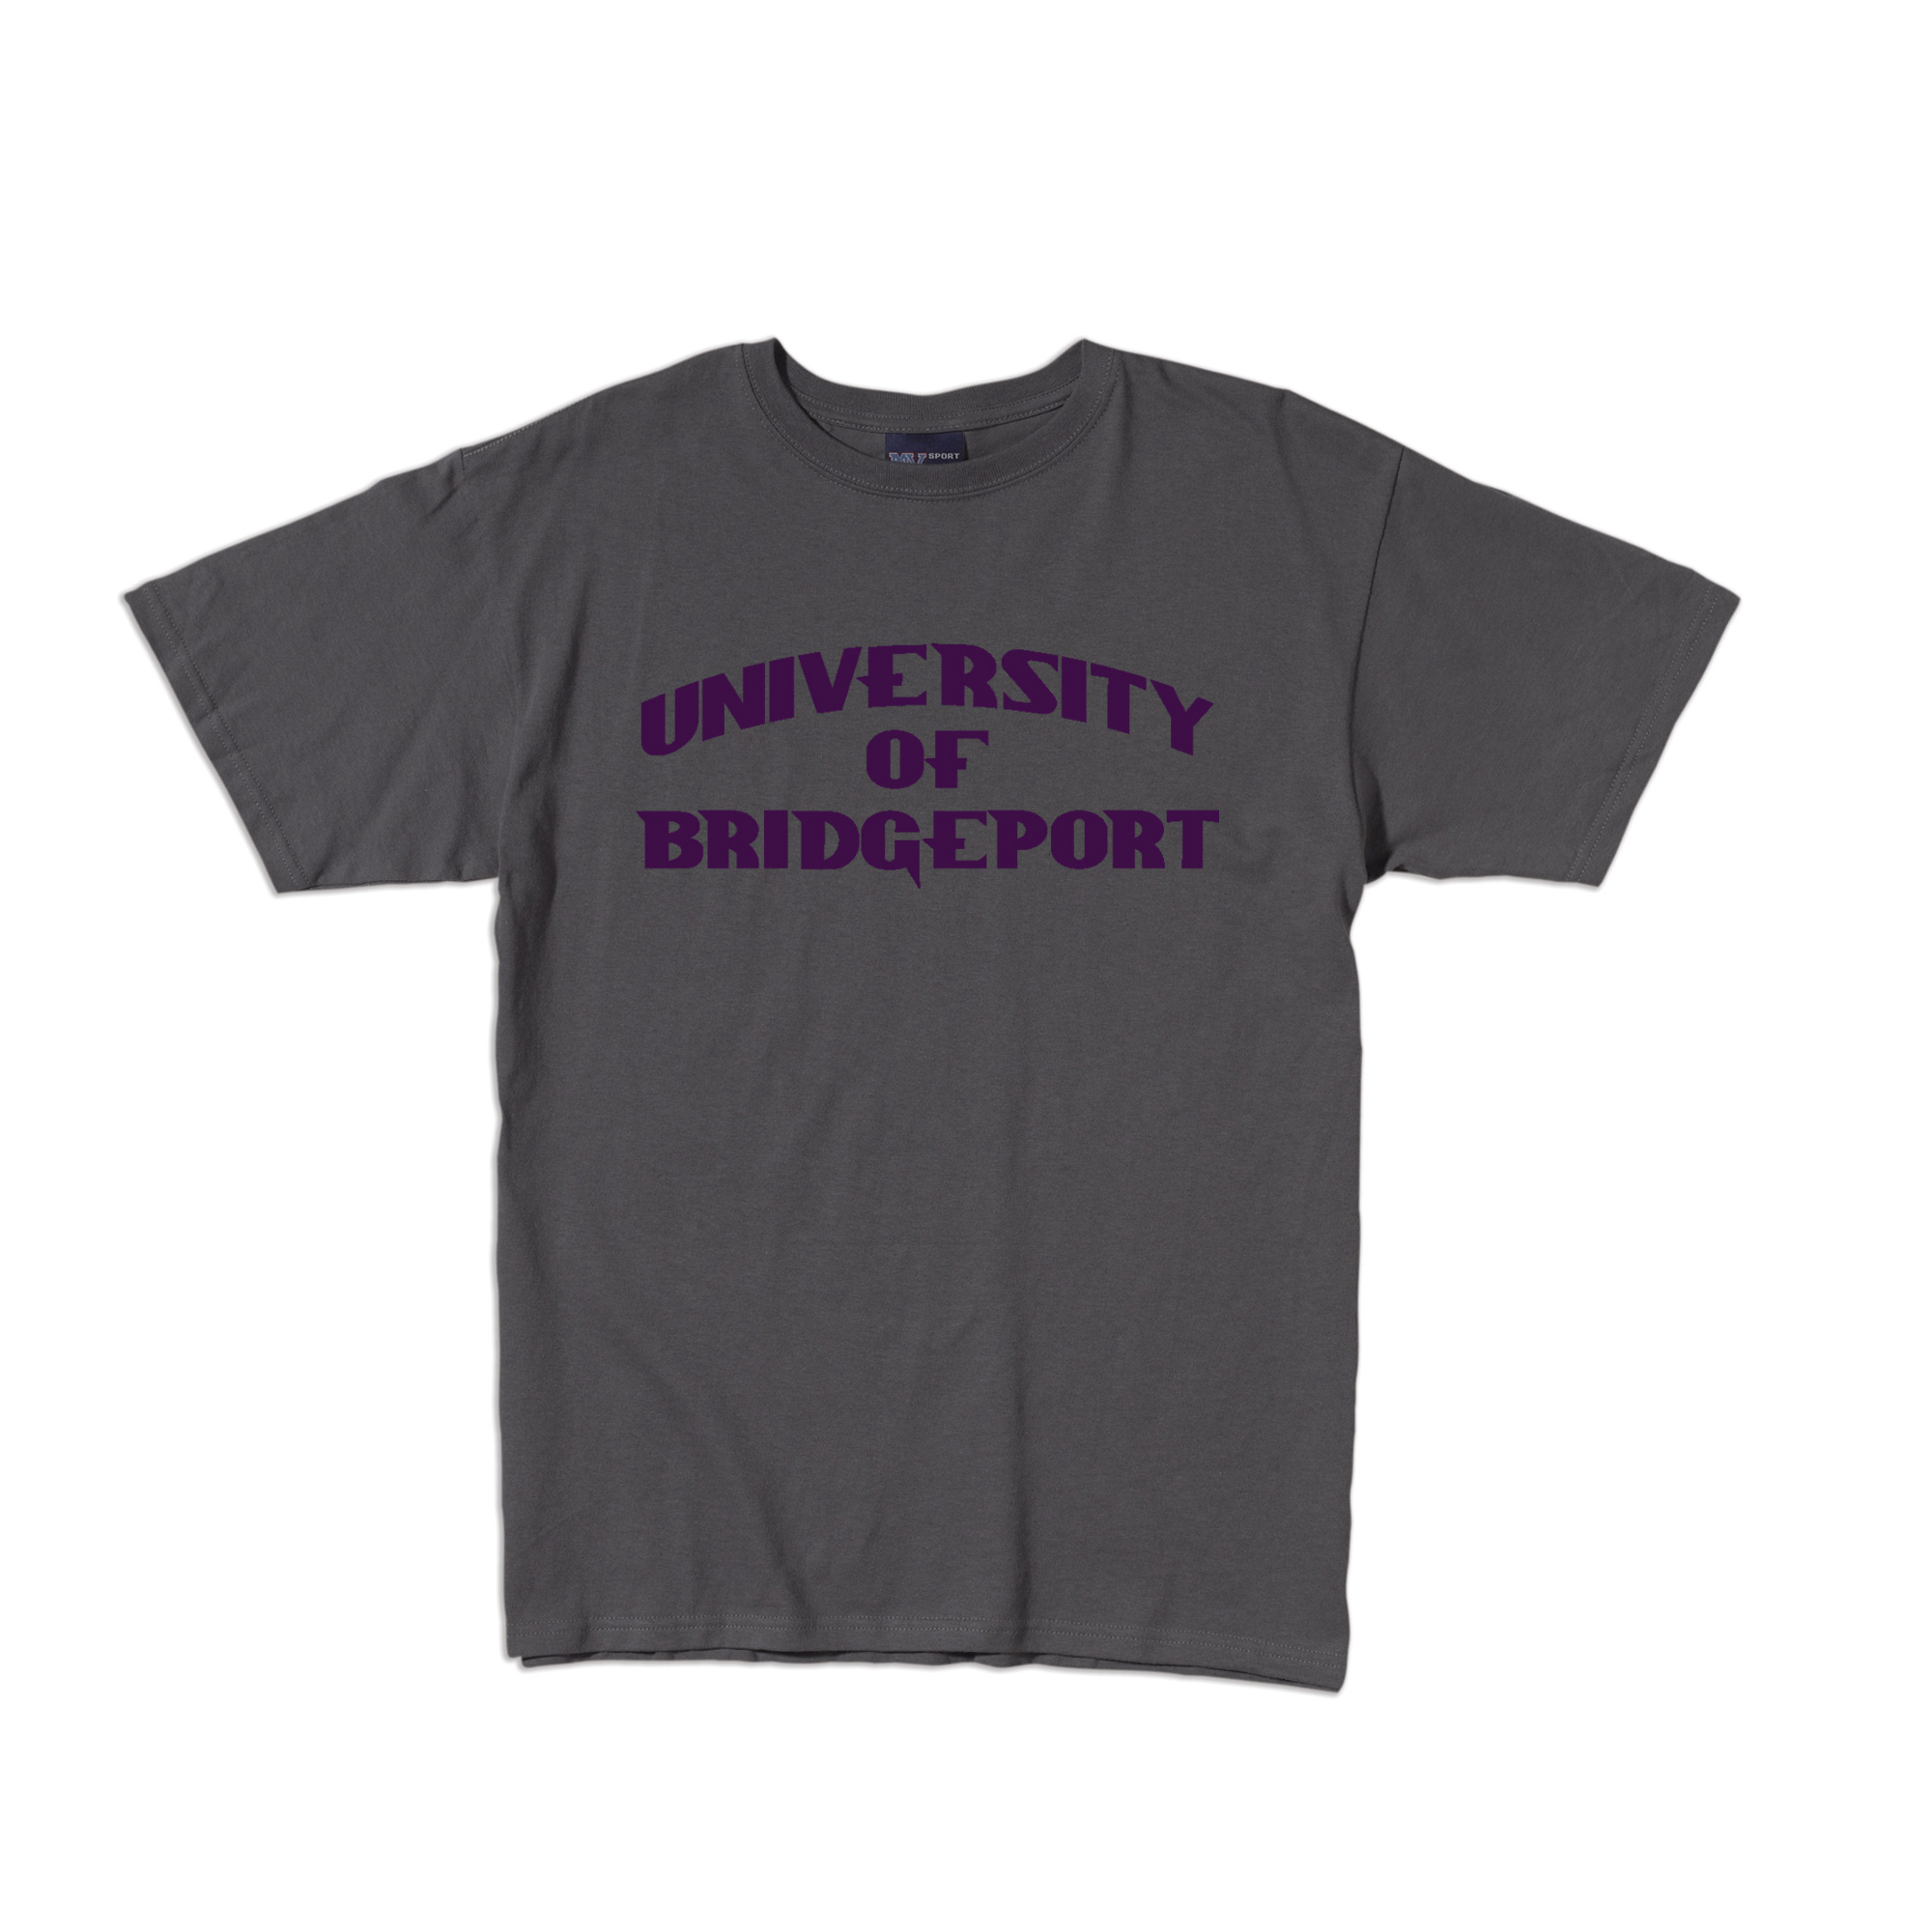 University of Bridgeport Tee - Vintage Granite